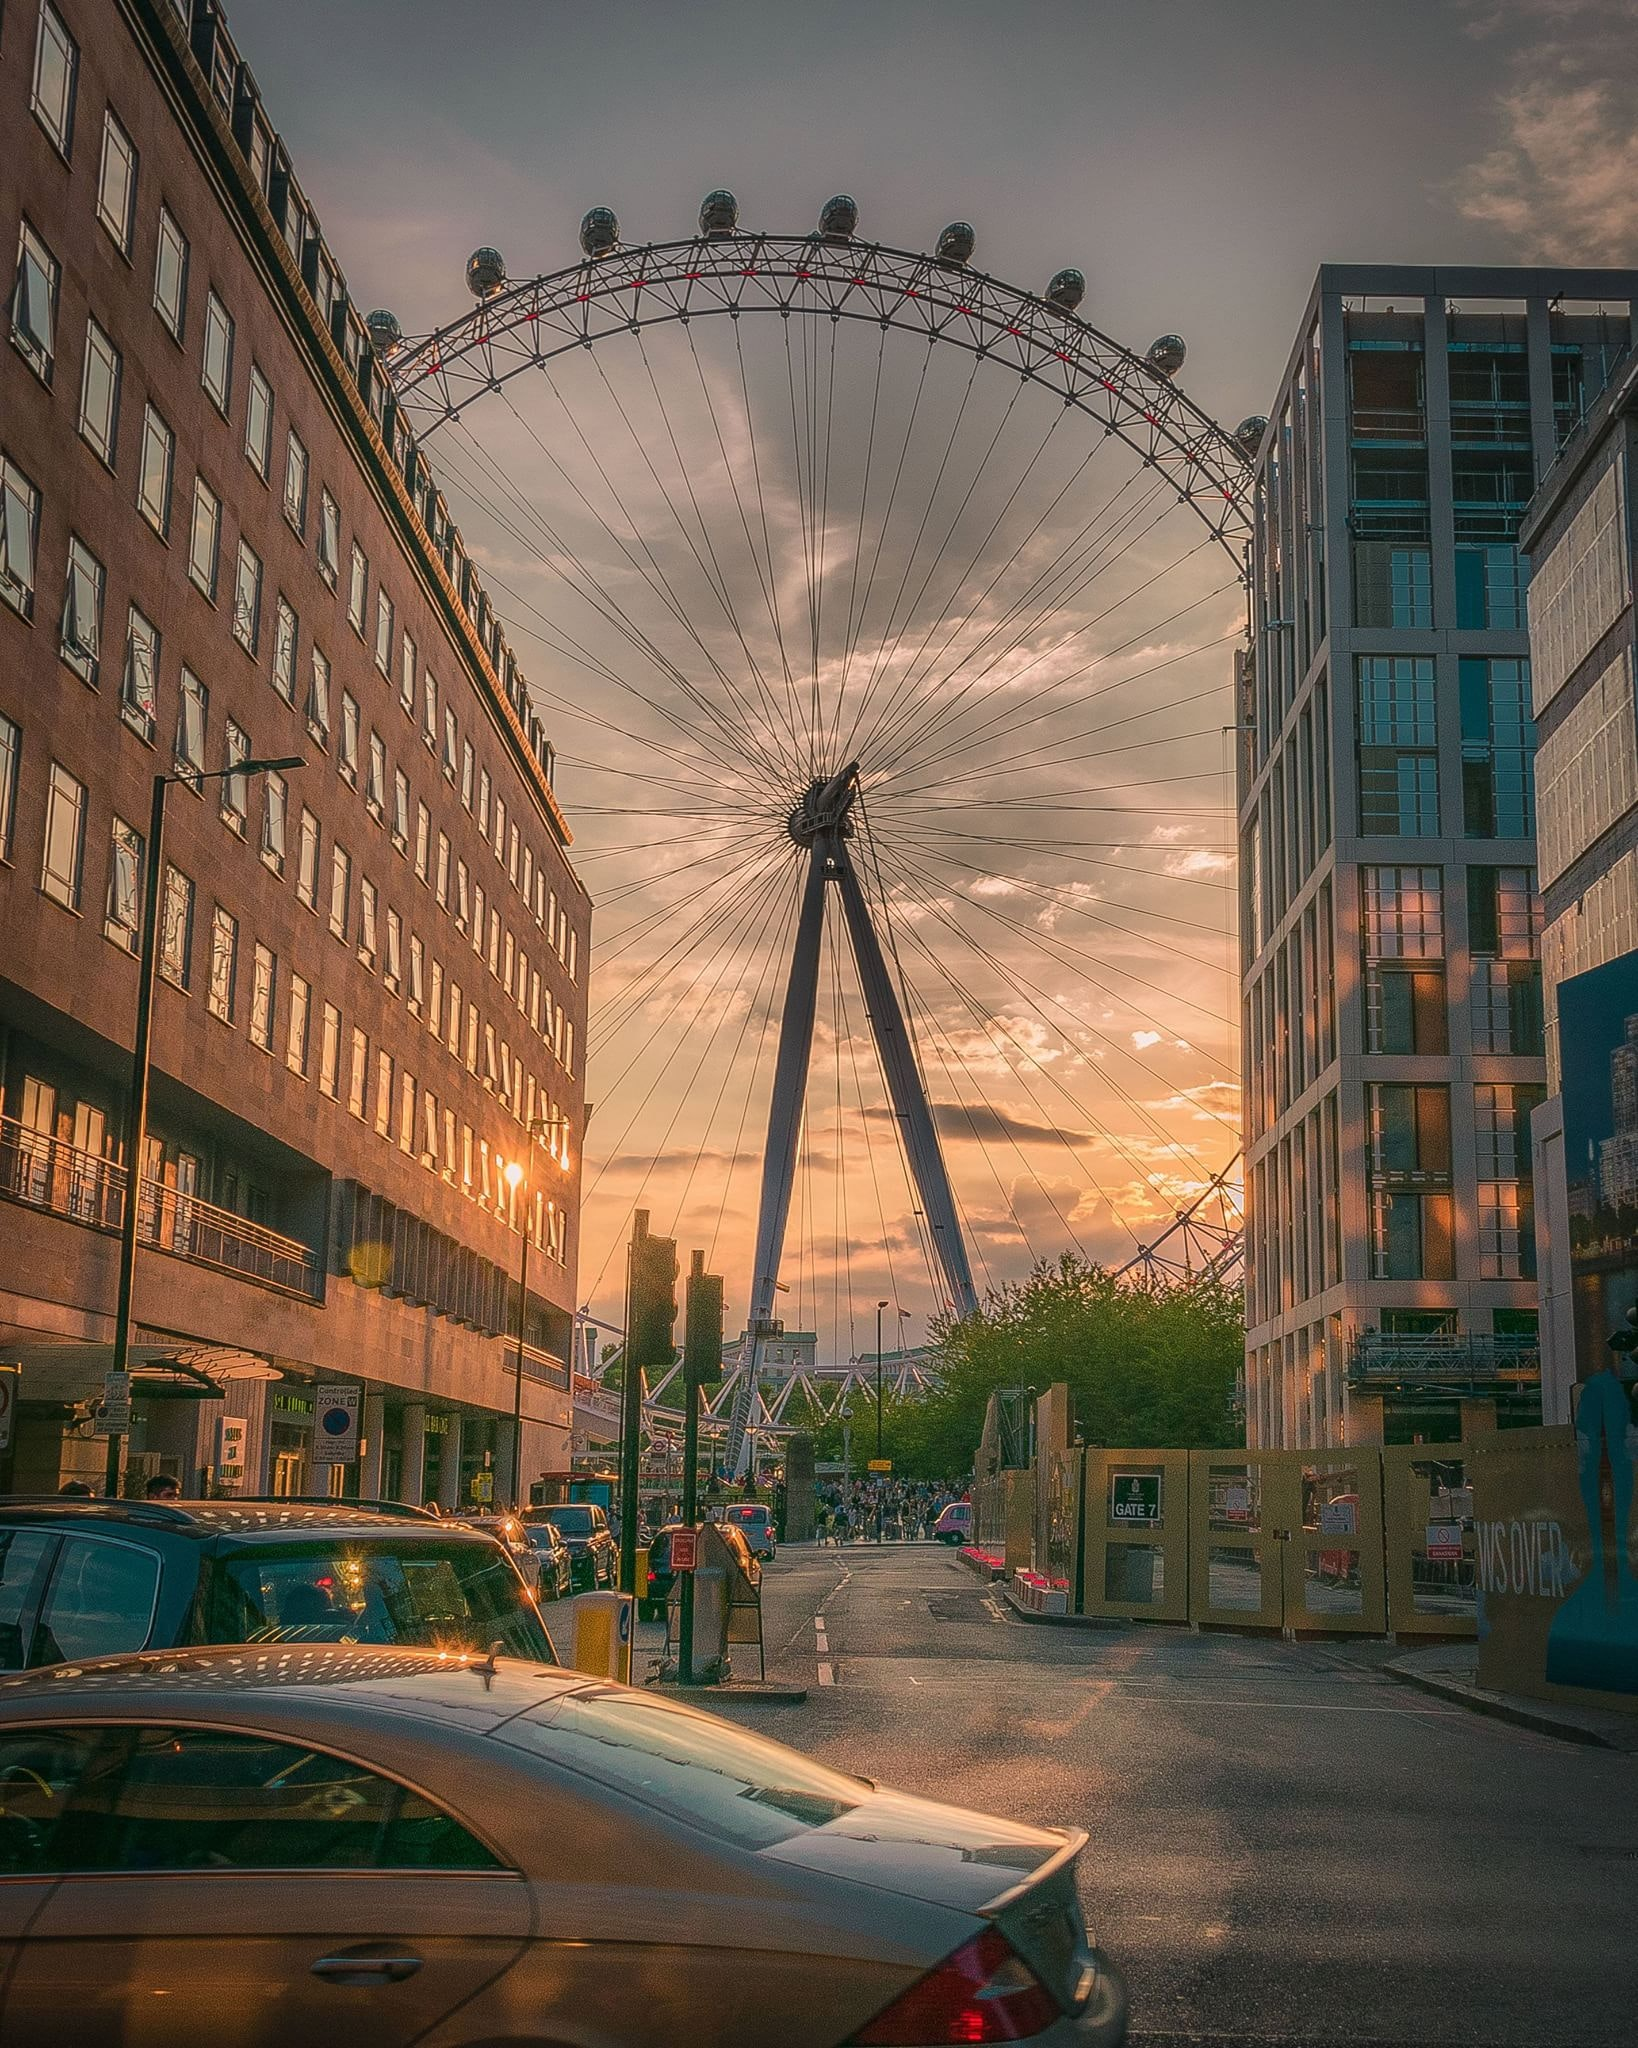 Ferris wheel near building during sunset photo